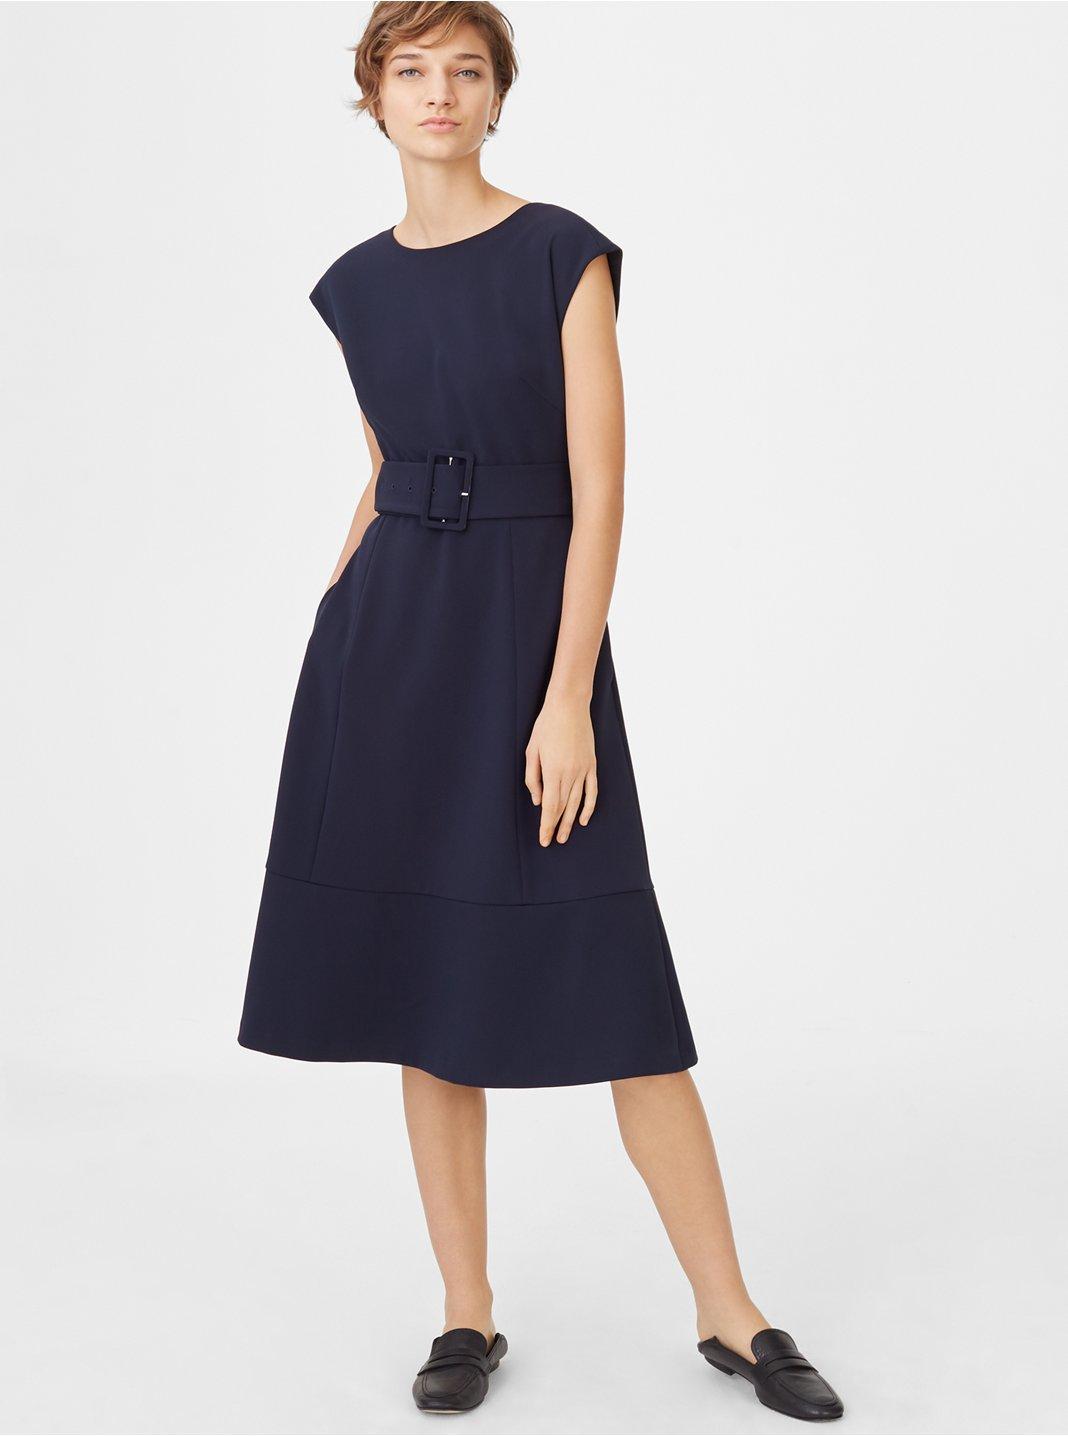 Lamontas Dress